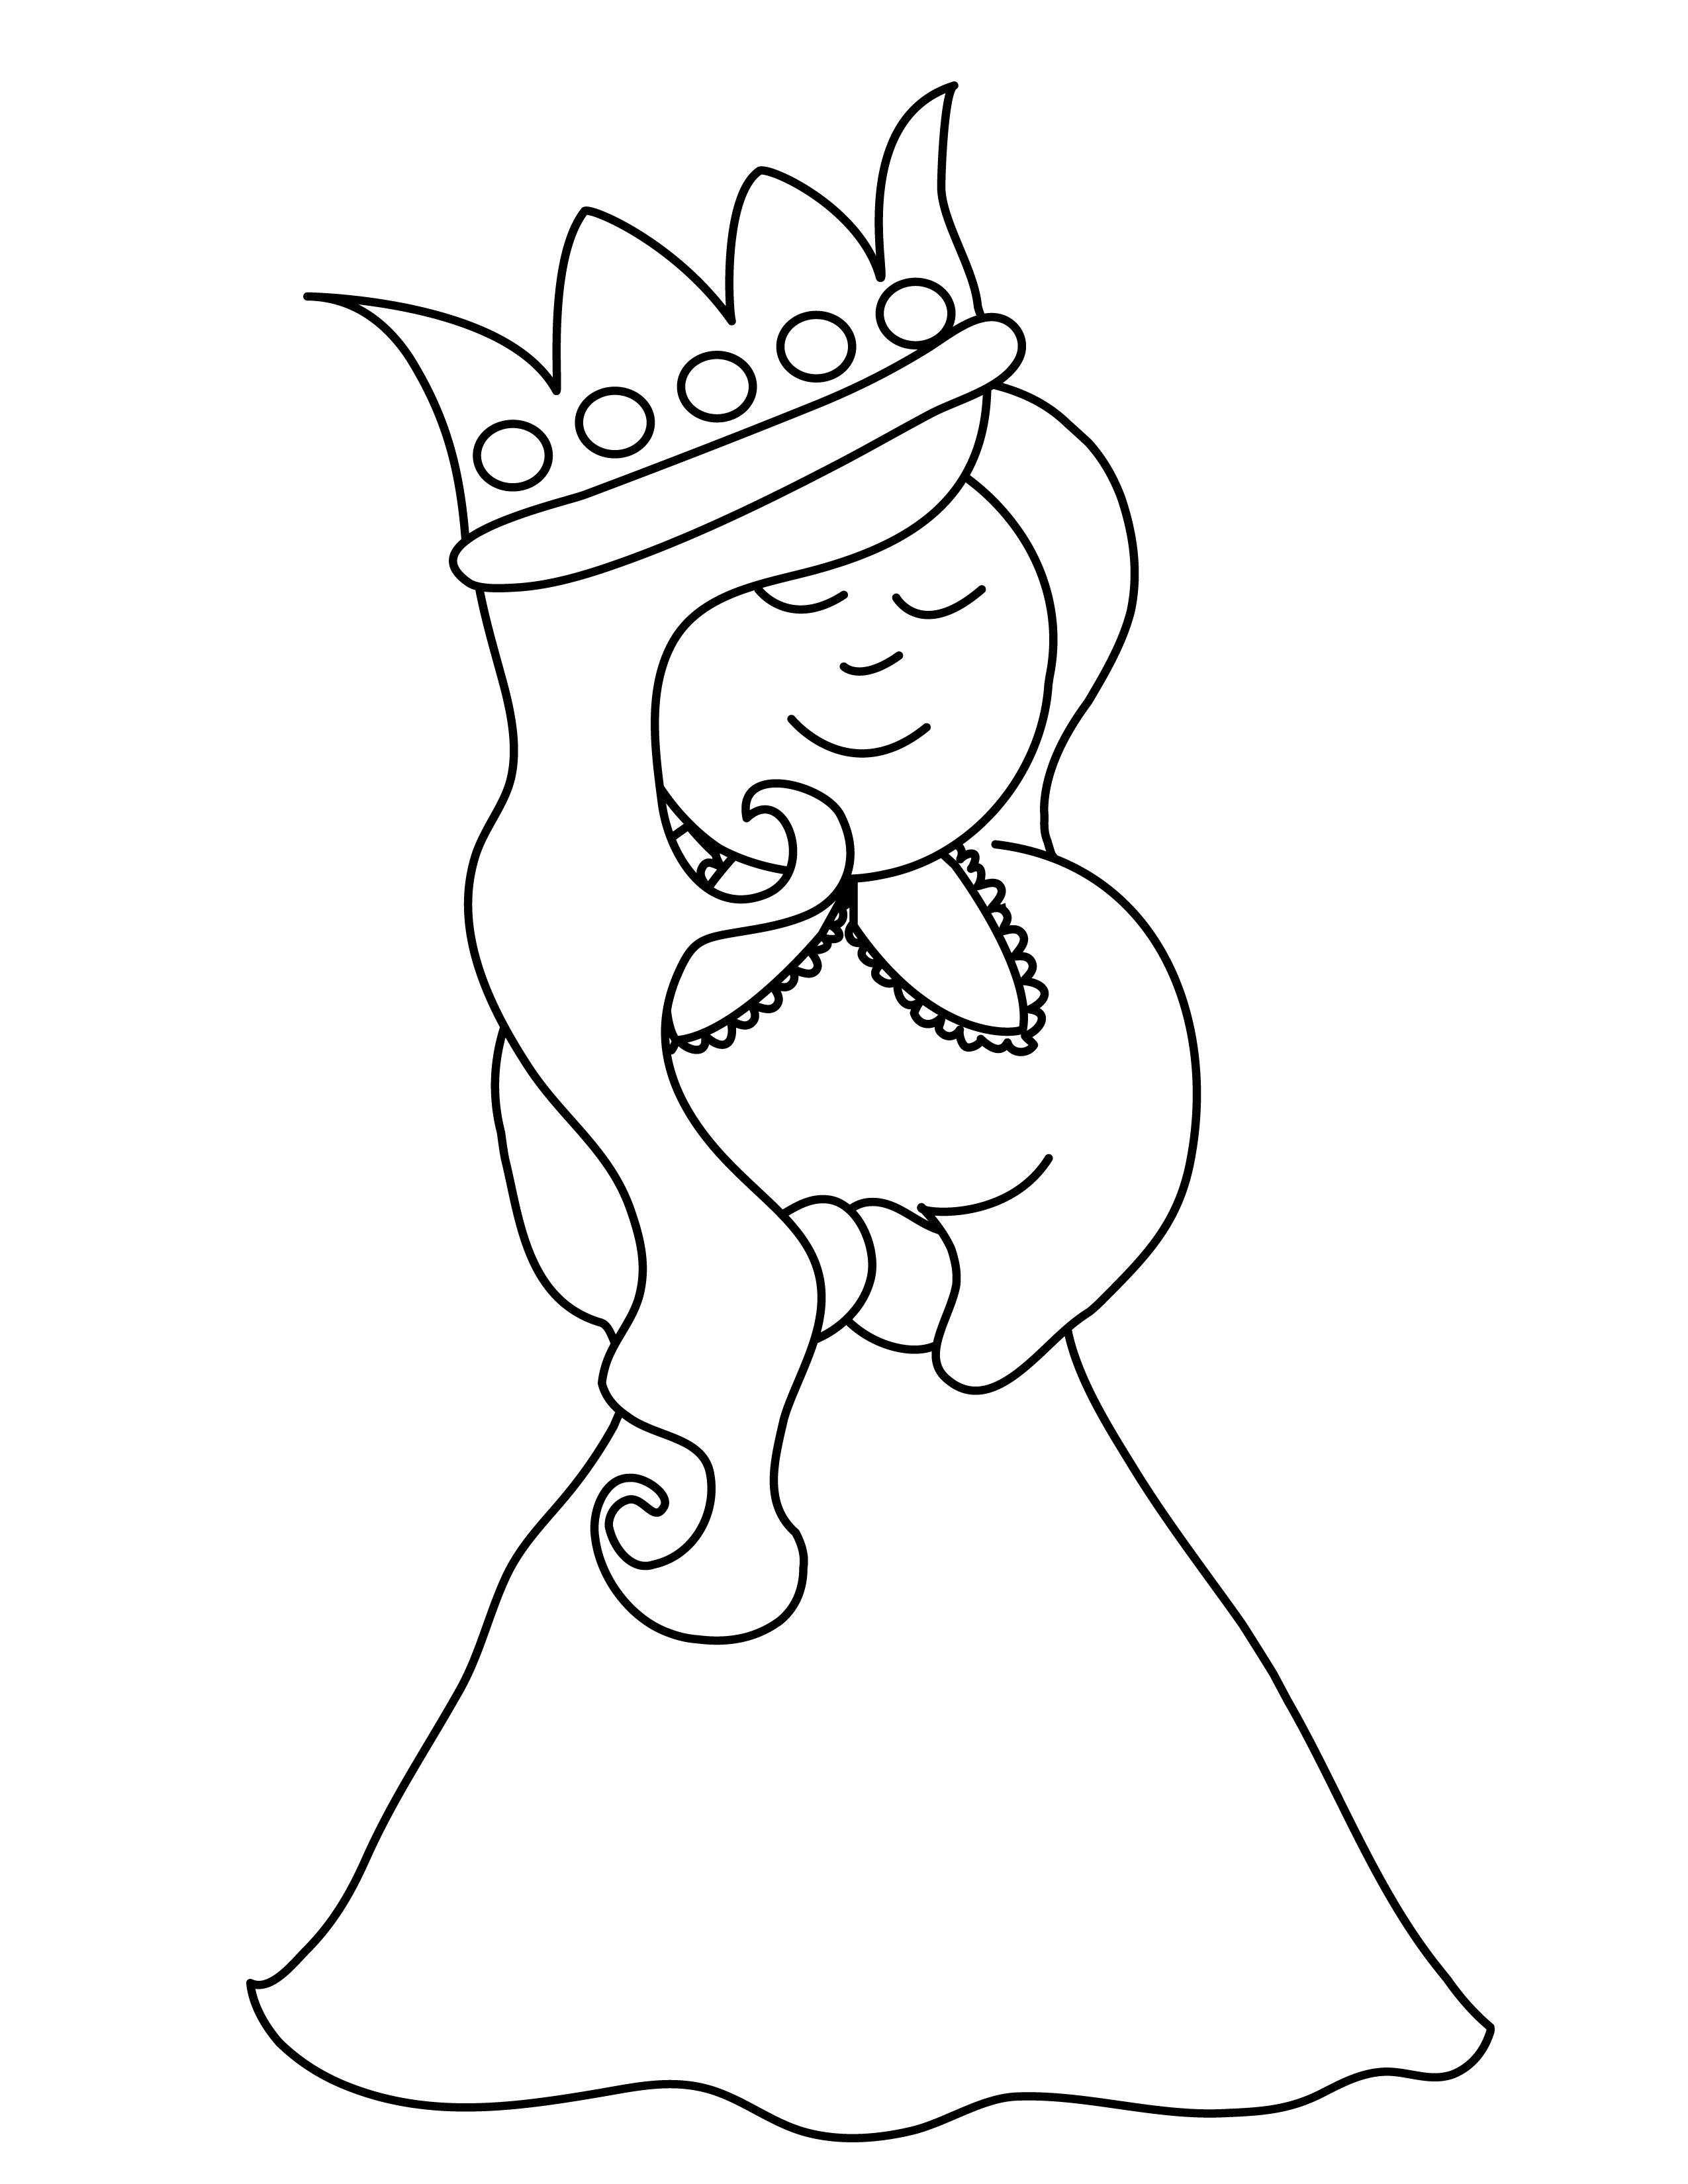 Monochrome clipart queen #7